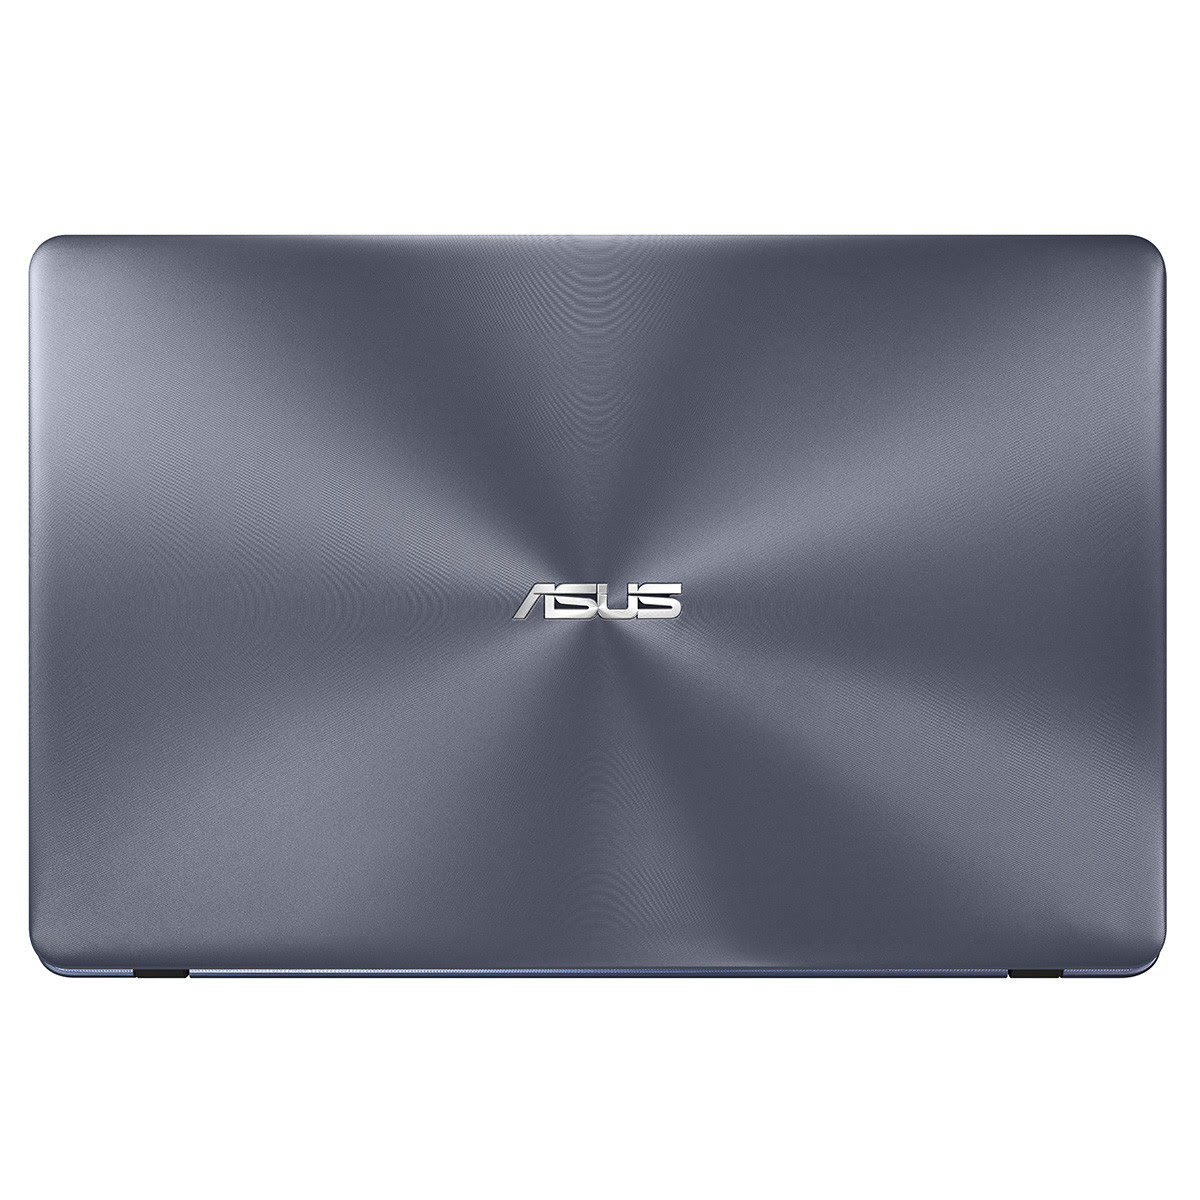 X705UF-GC118T - i5 8250/8G/256G+500G/MX130/17.3/10 (90NB0IE1-M01490) - Achat / Vente PC portable sur Picata.fr - 2